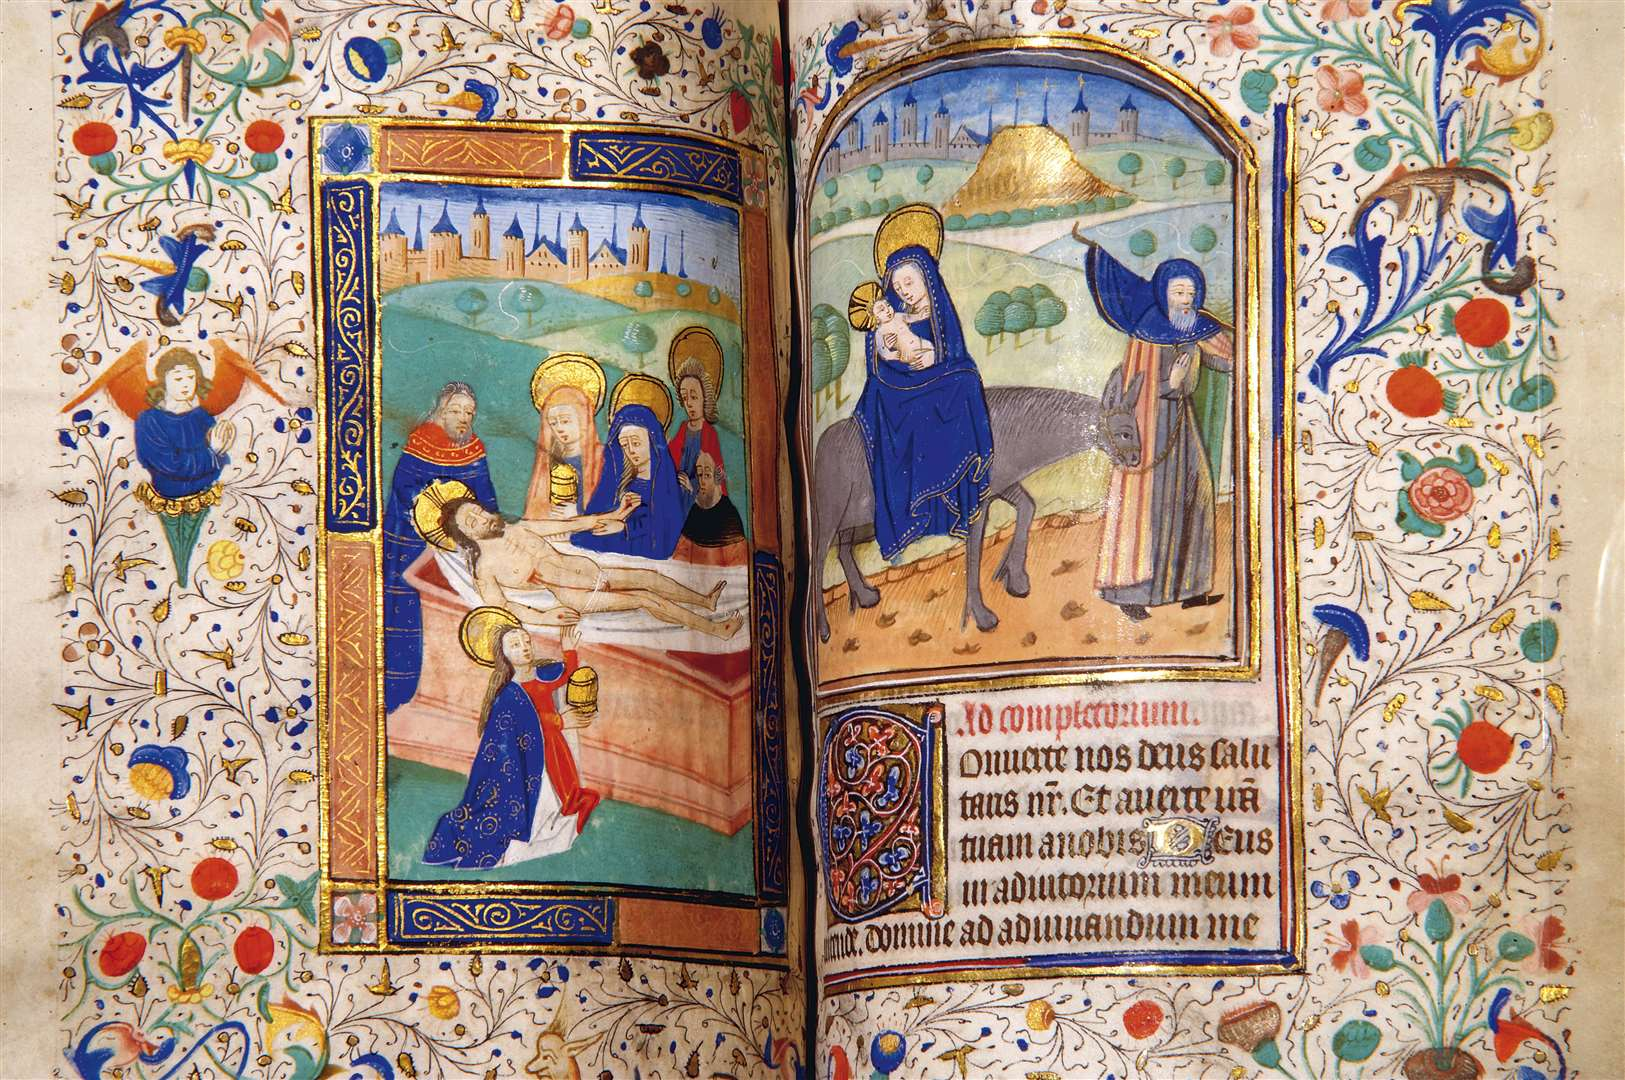 The Book of Hours - Anne Boleyn's prayer book.